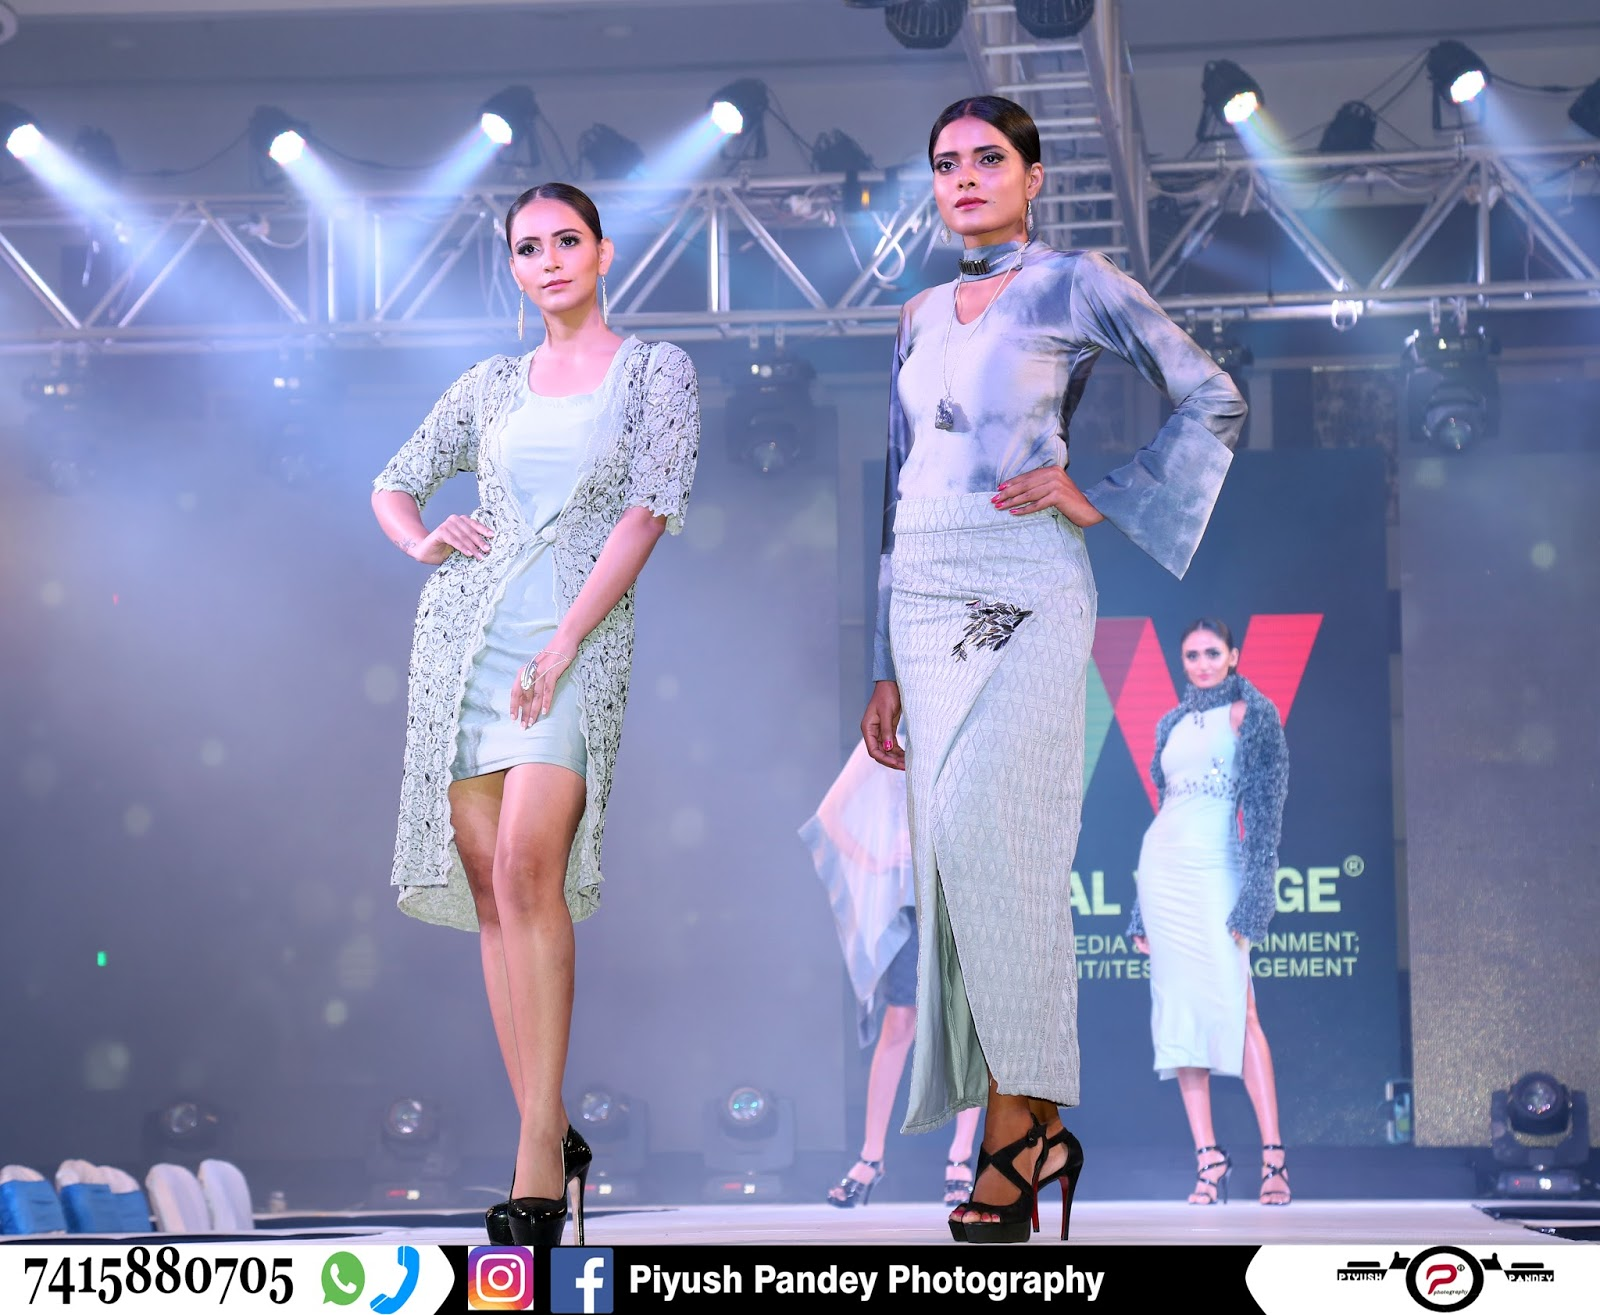 fashion photography | piyushpandeyphotography